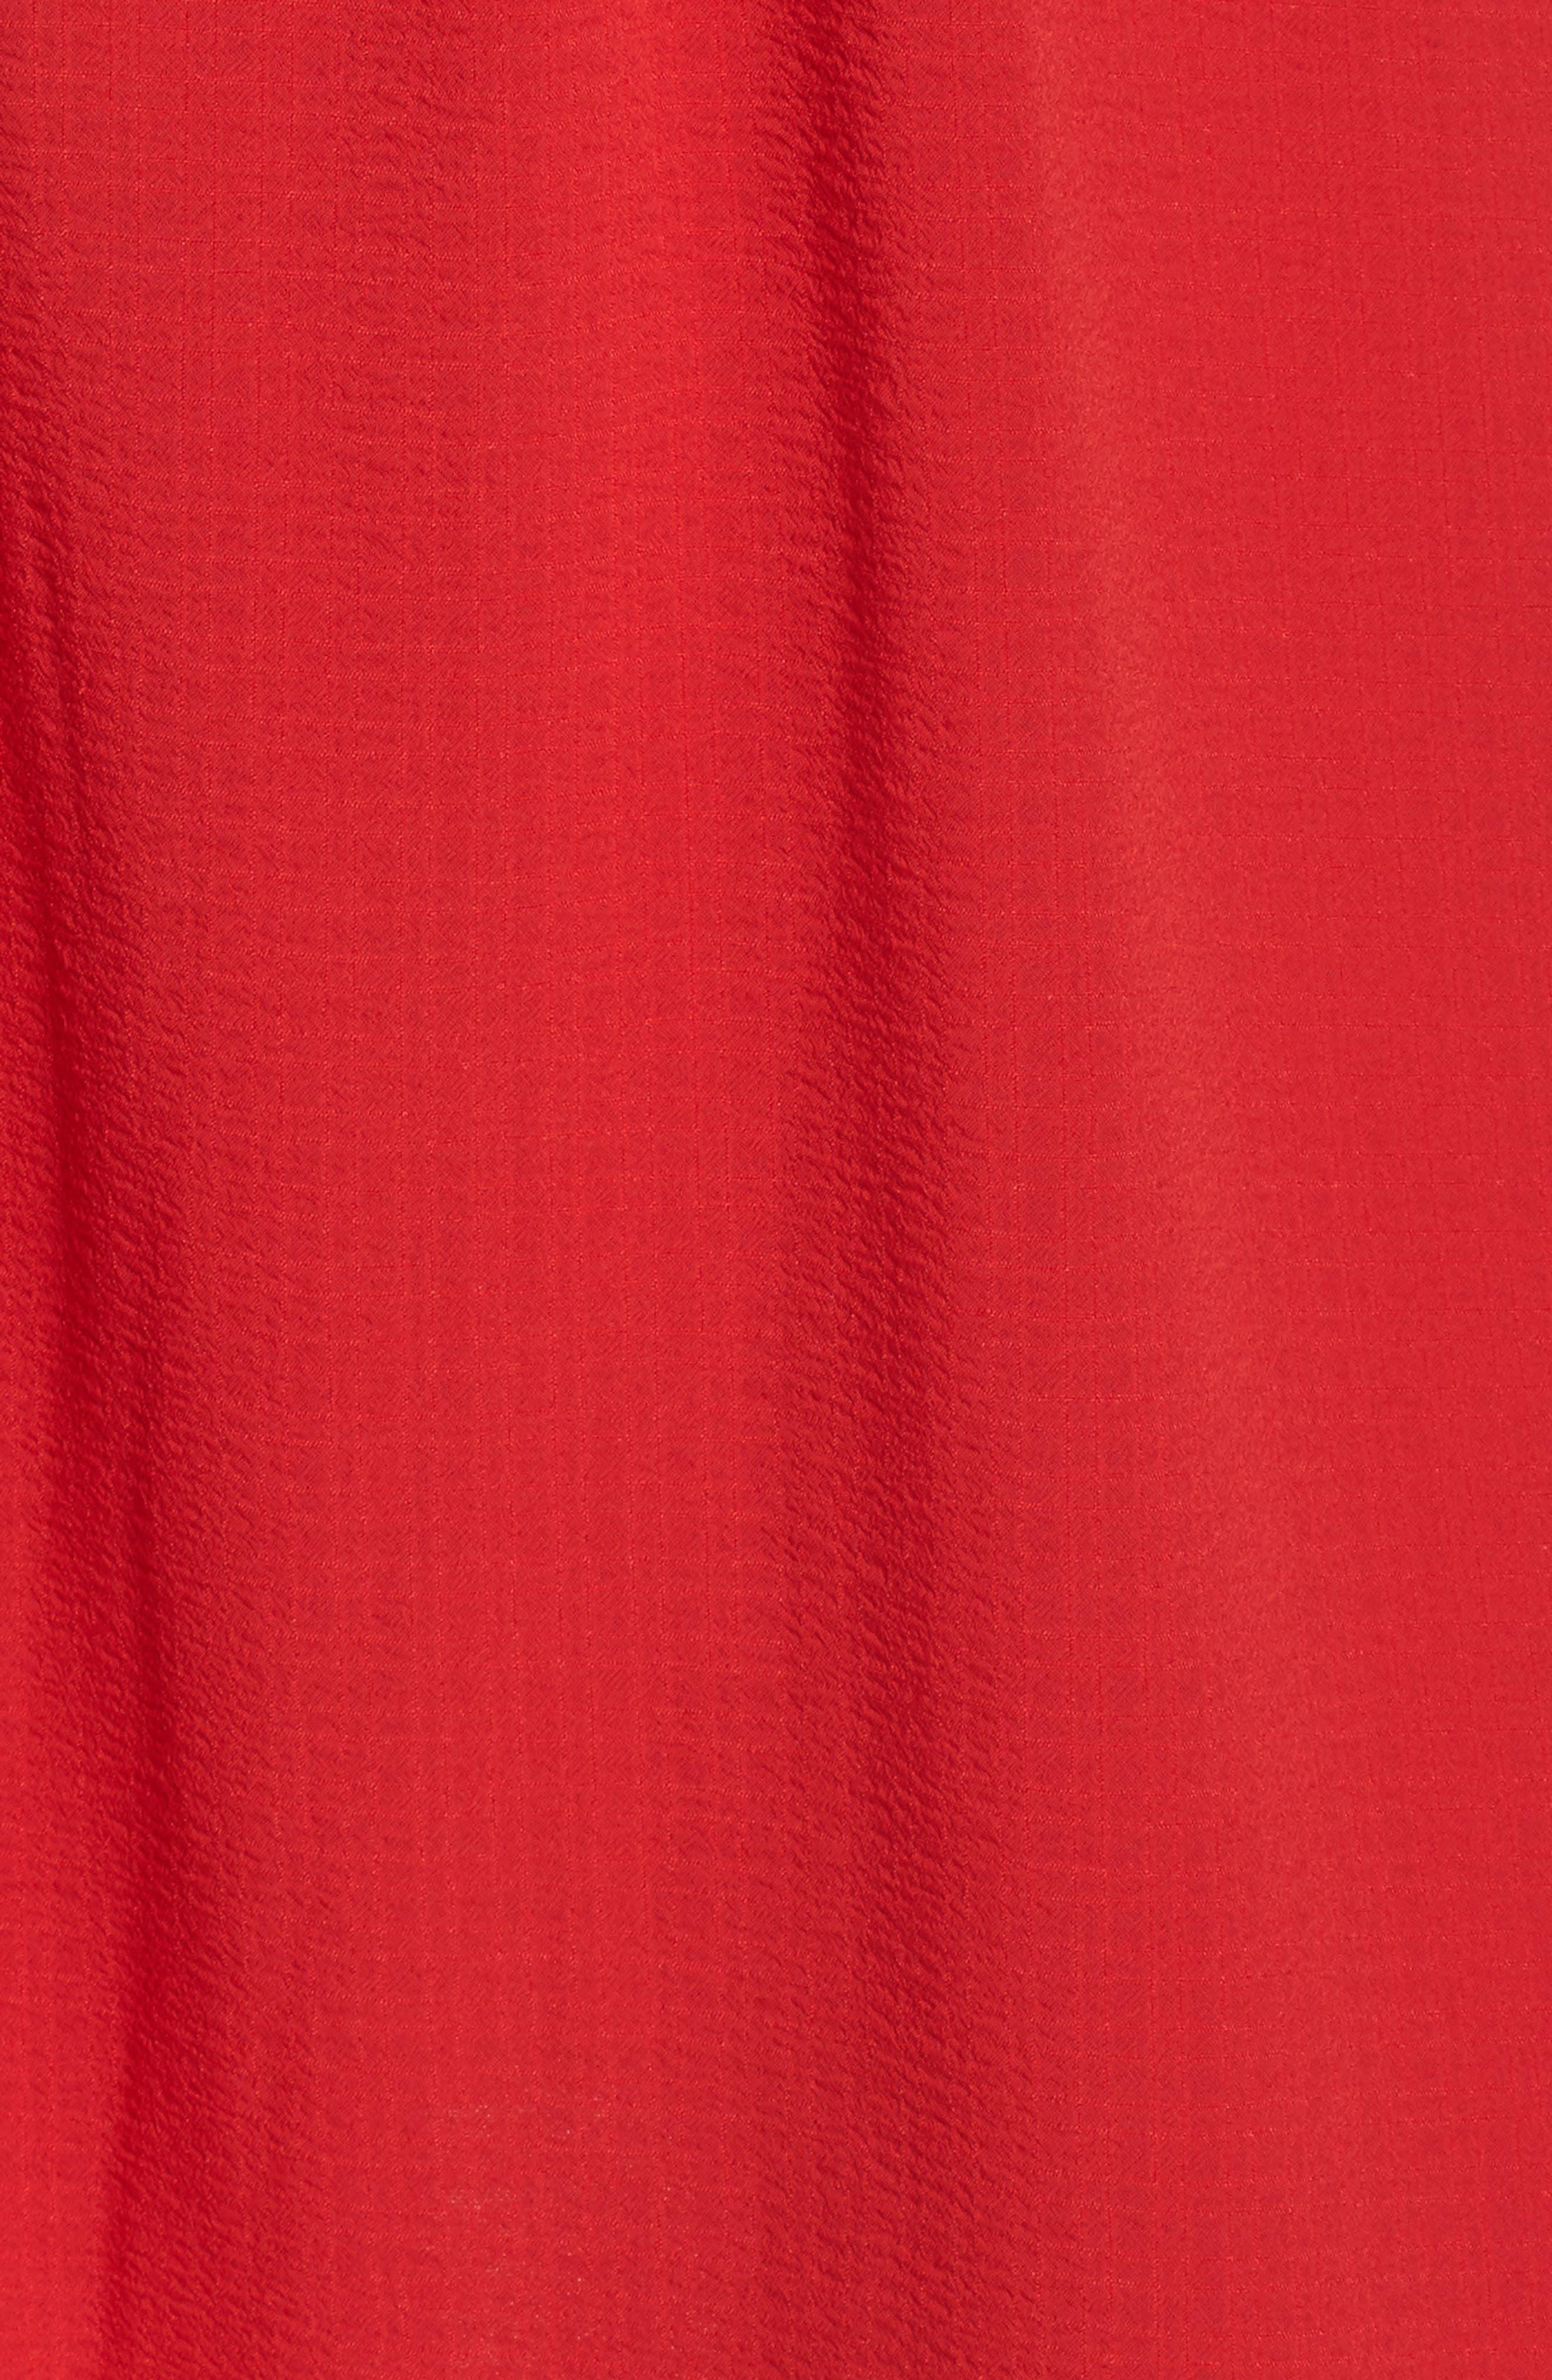 Ruffle Cold Shoulder Dress,                             Alternate thumbnail 5, color,                             821